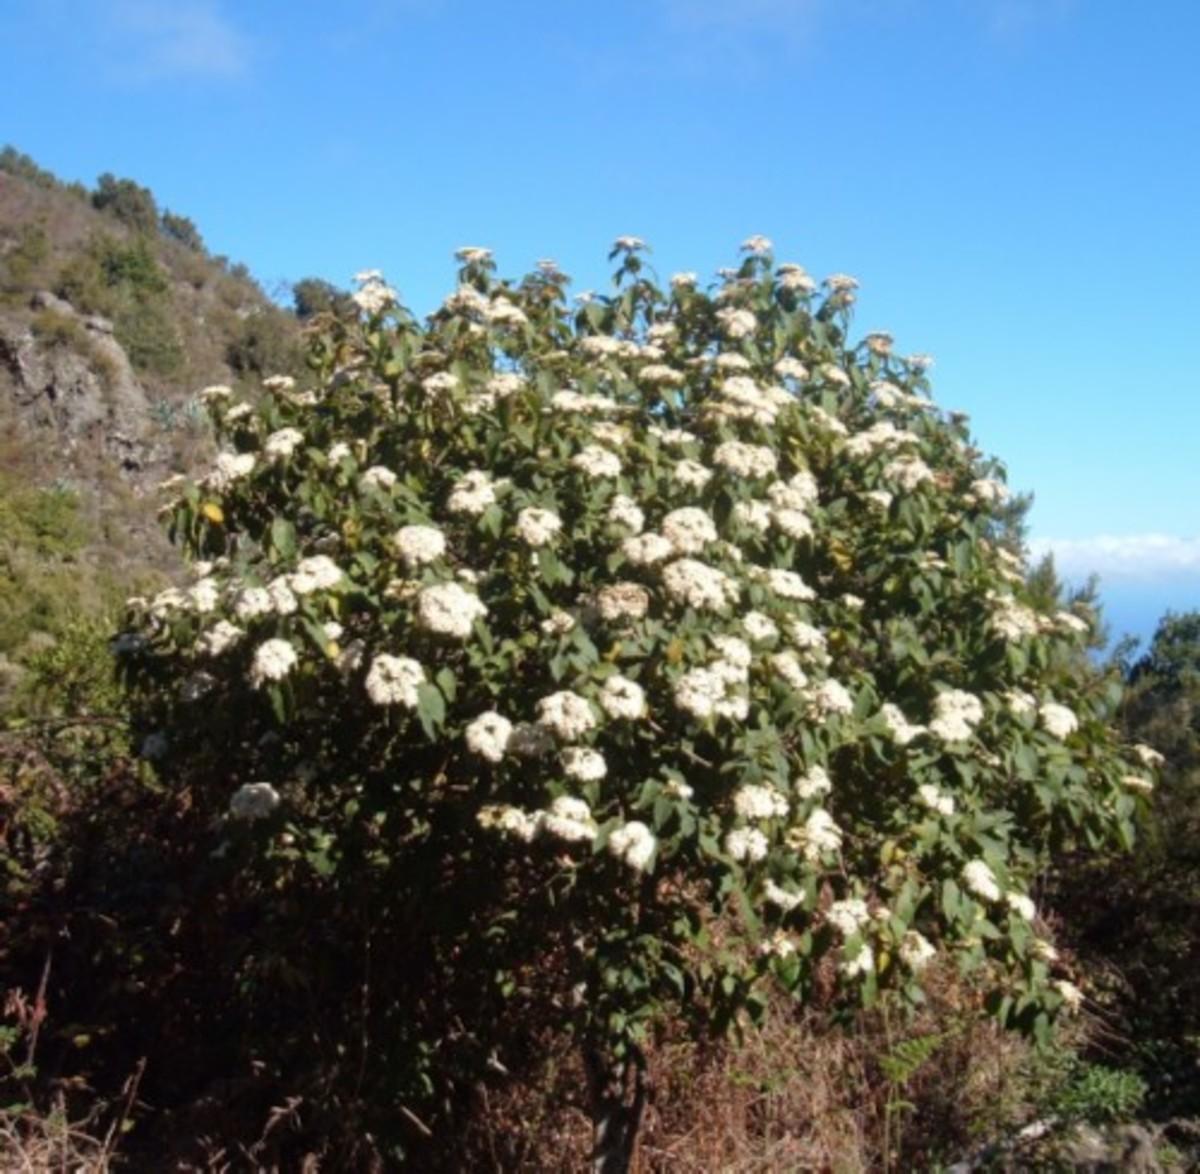 Viburnum rigidum in full flower. Photo by Steve Andrews